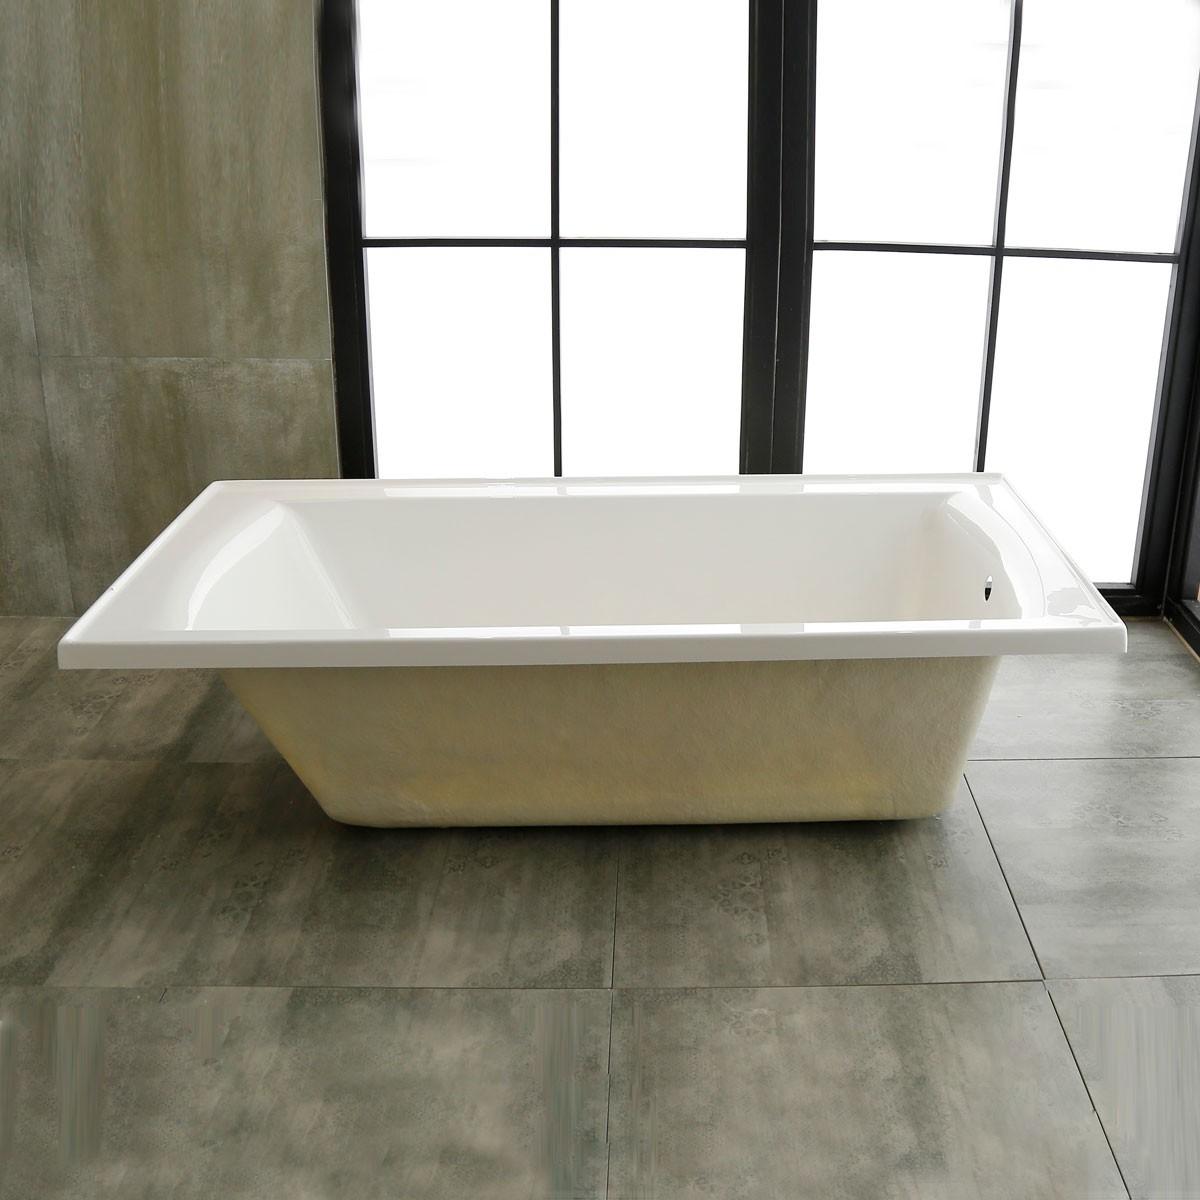 60 In Drop-in Bathtub - Acrylic White (DK-3358) | Decoraport Canada